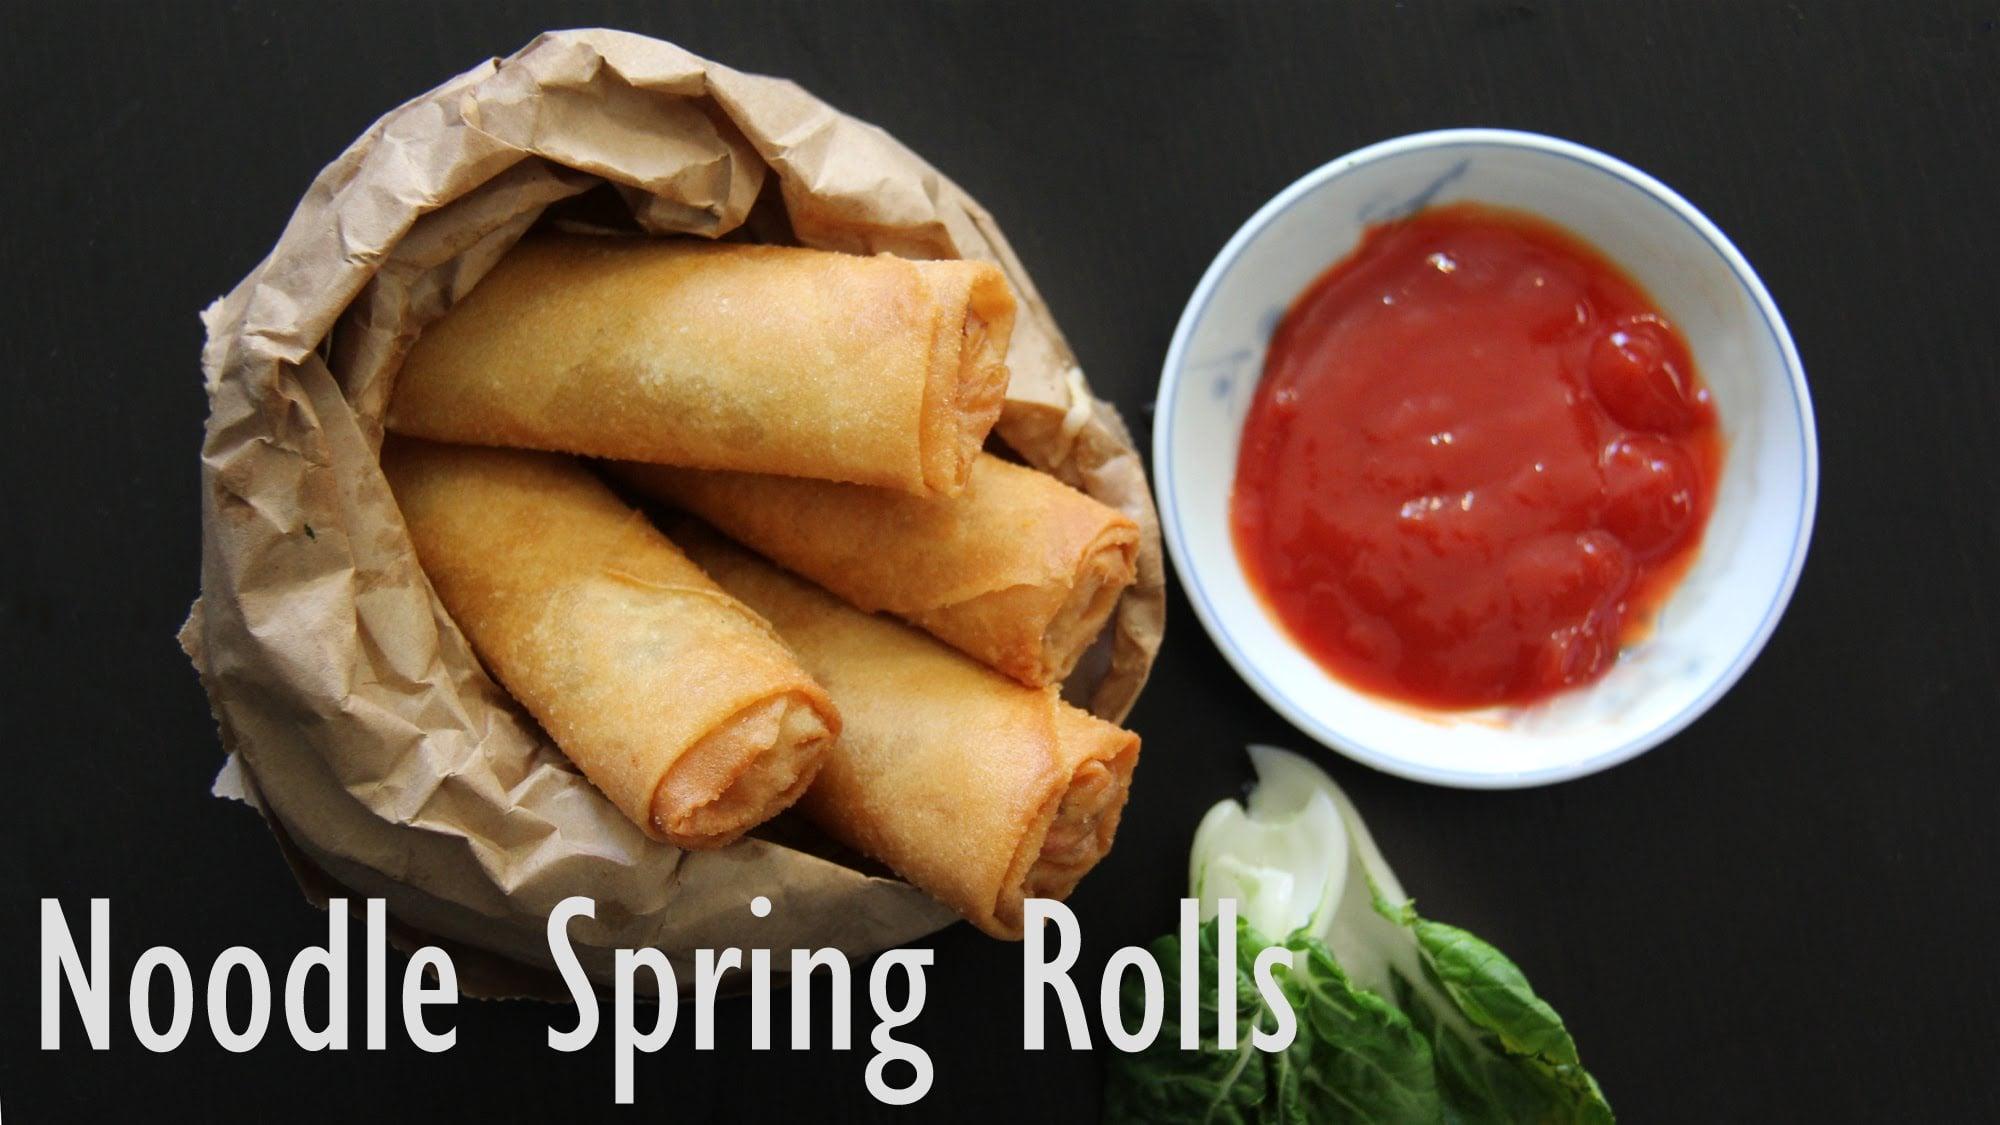 Spring Rolls   How to make Veg Spring Rolls- Easy Indian Veg Appetizer & Starter Recipes by Shilpi